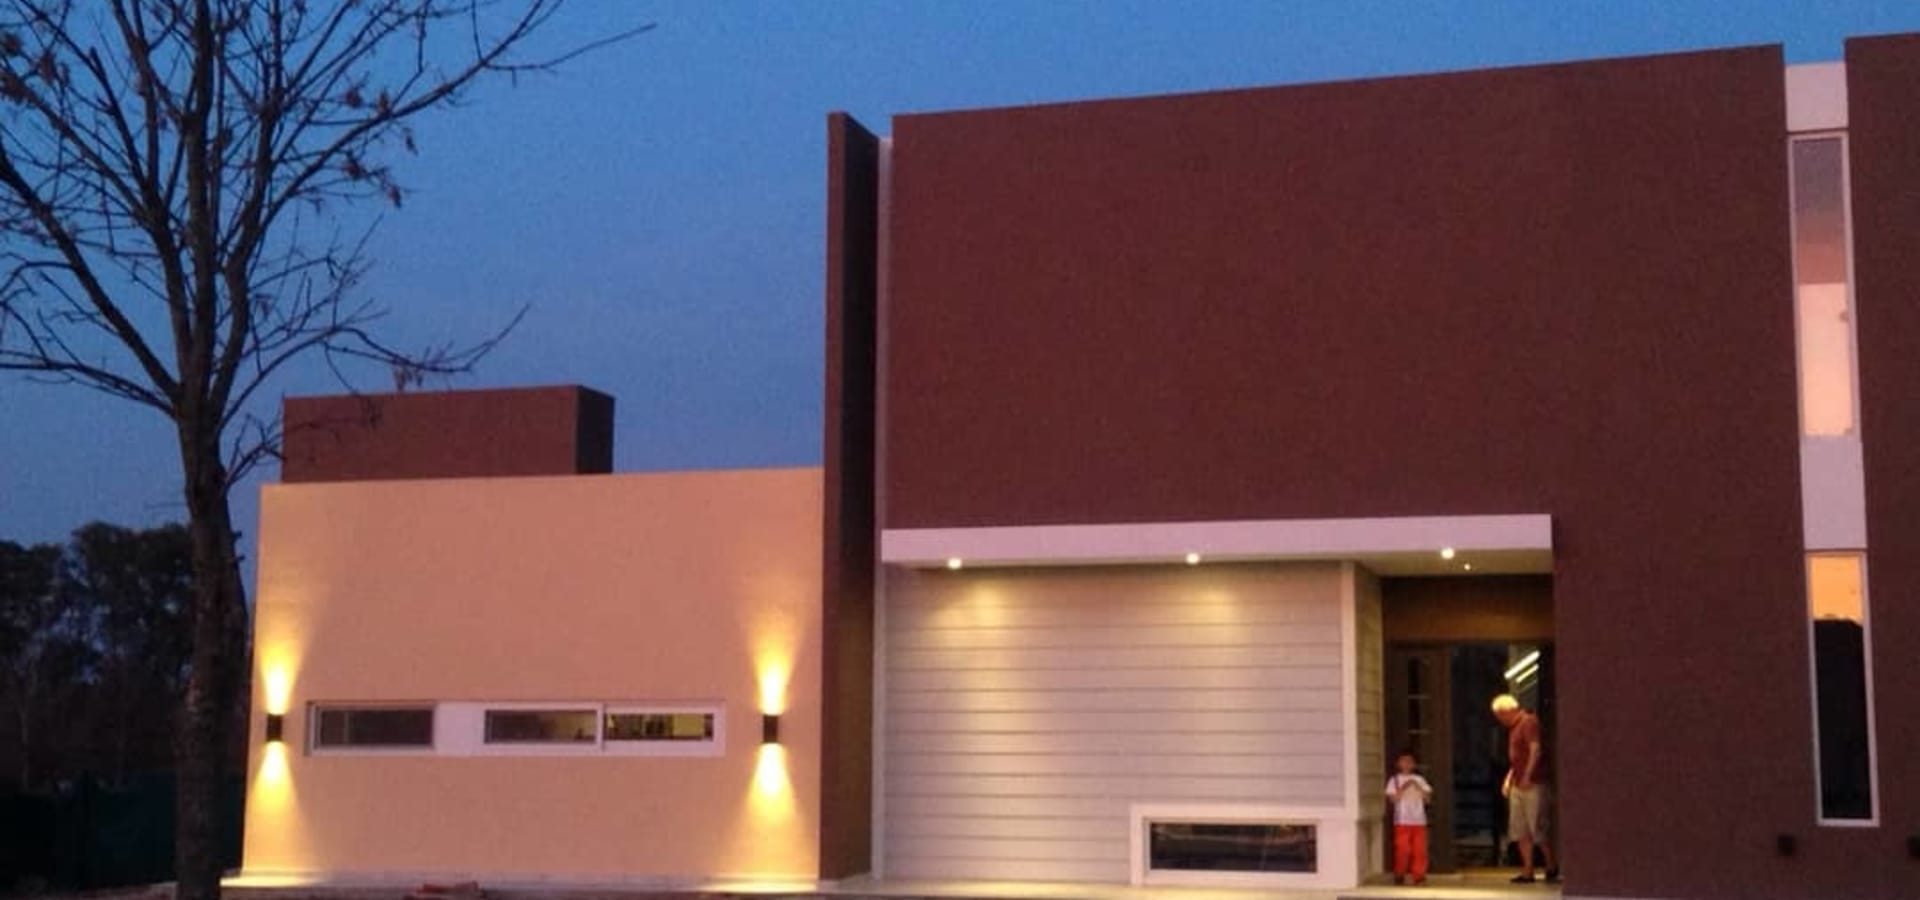 Montaggio Arquitectura en Seco